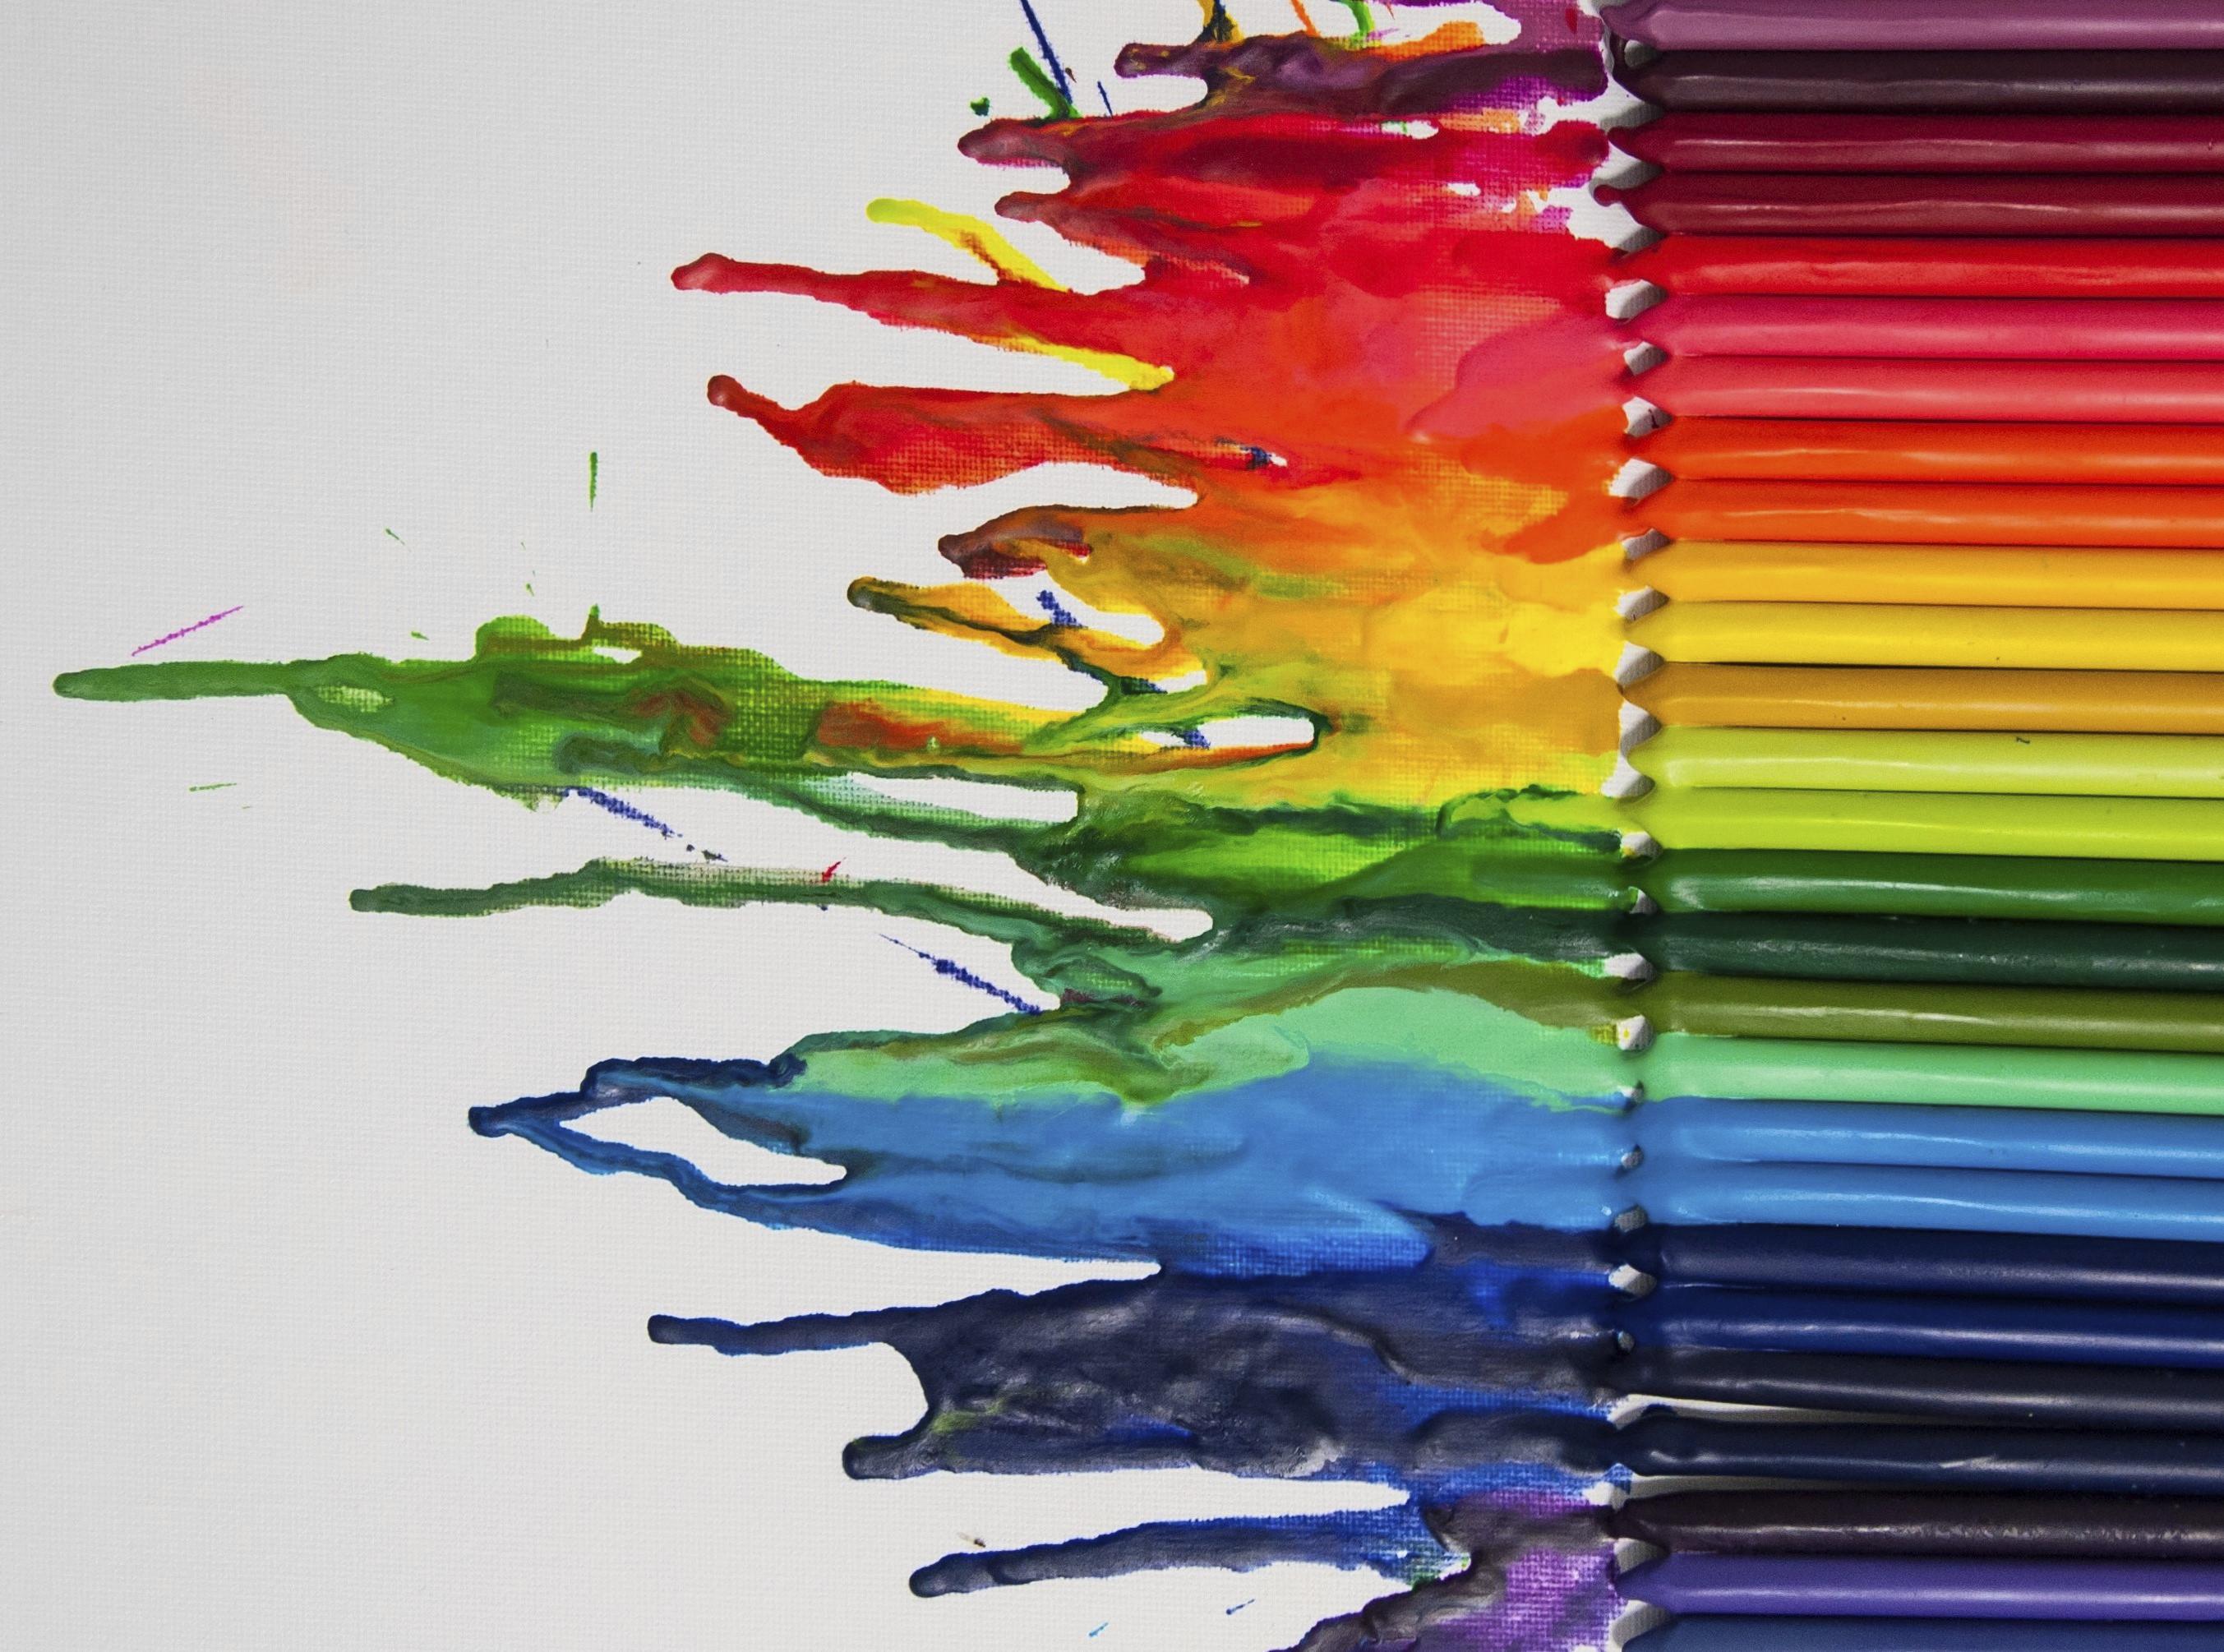 melted crayon art.jpg